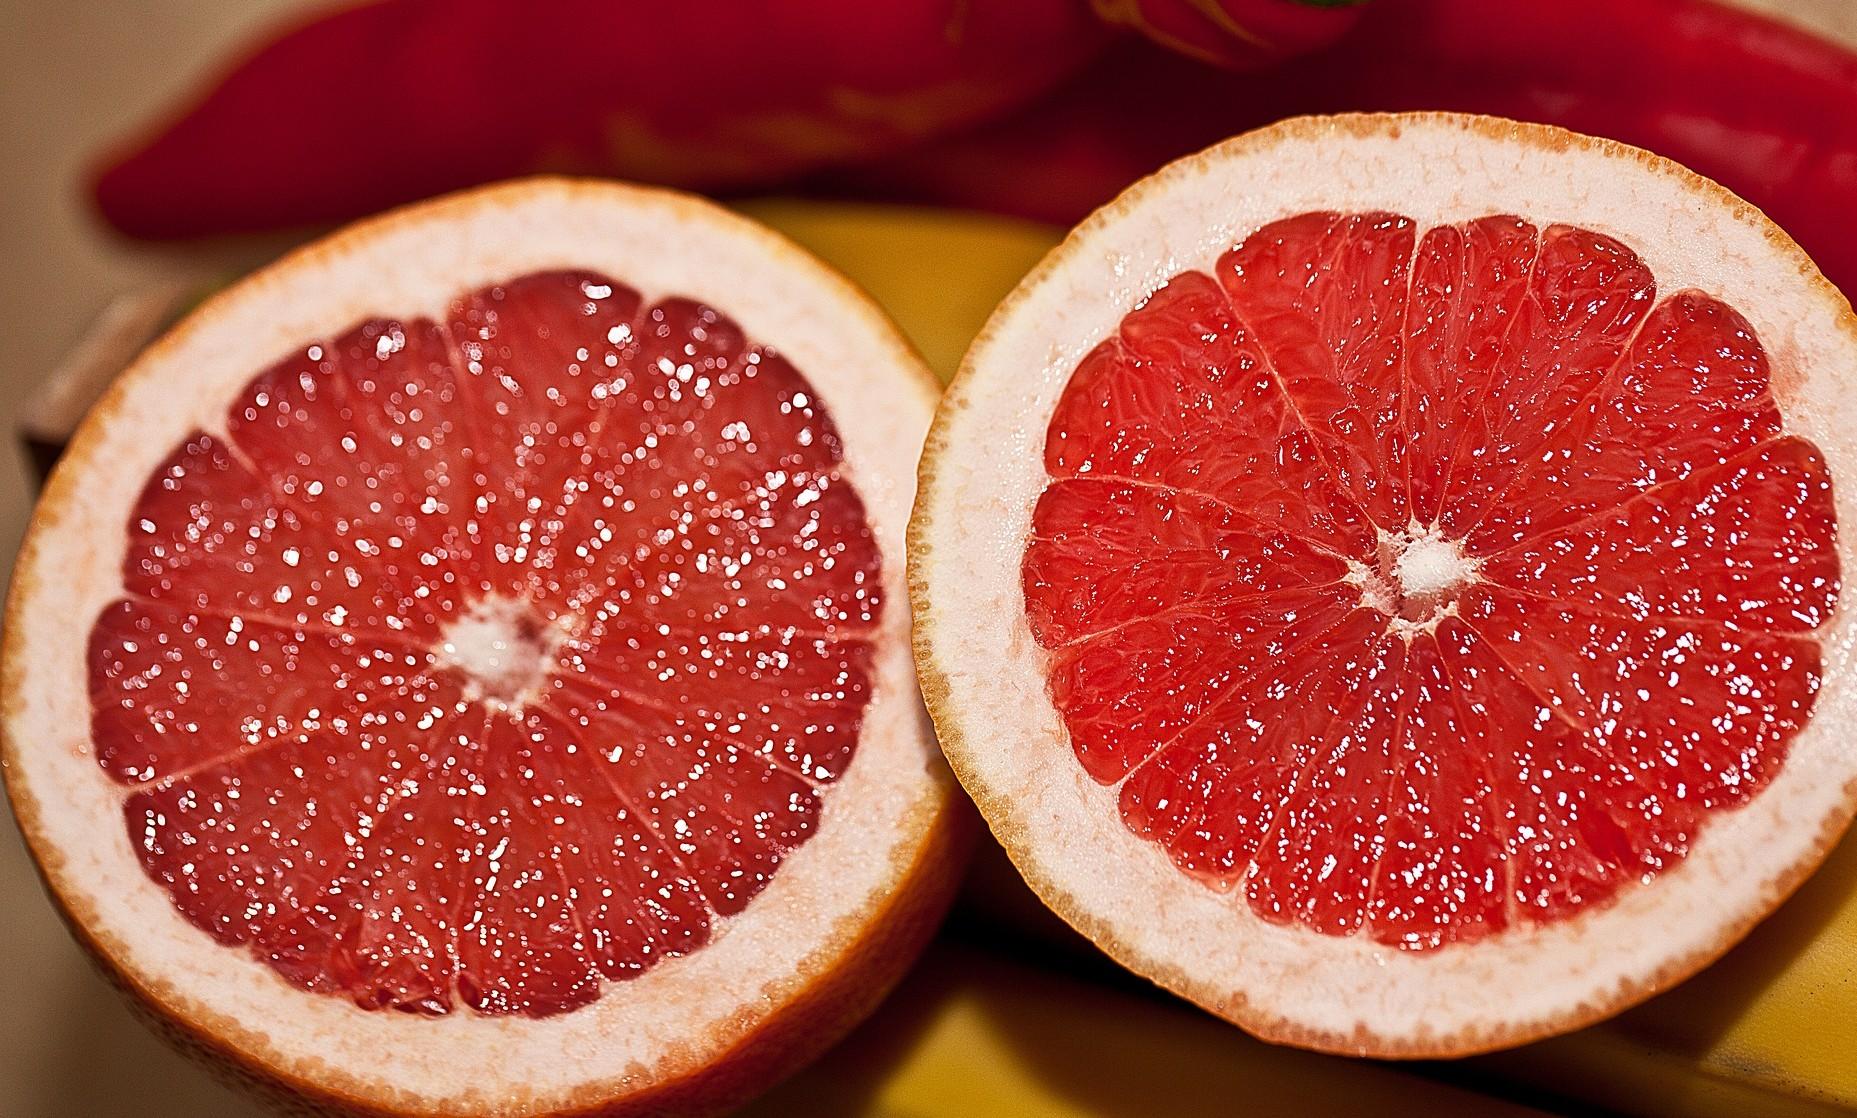 Grapefruit exports running at a jog